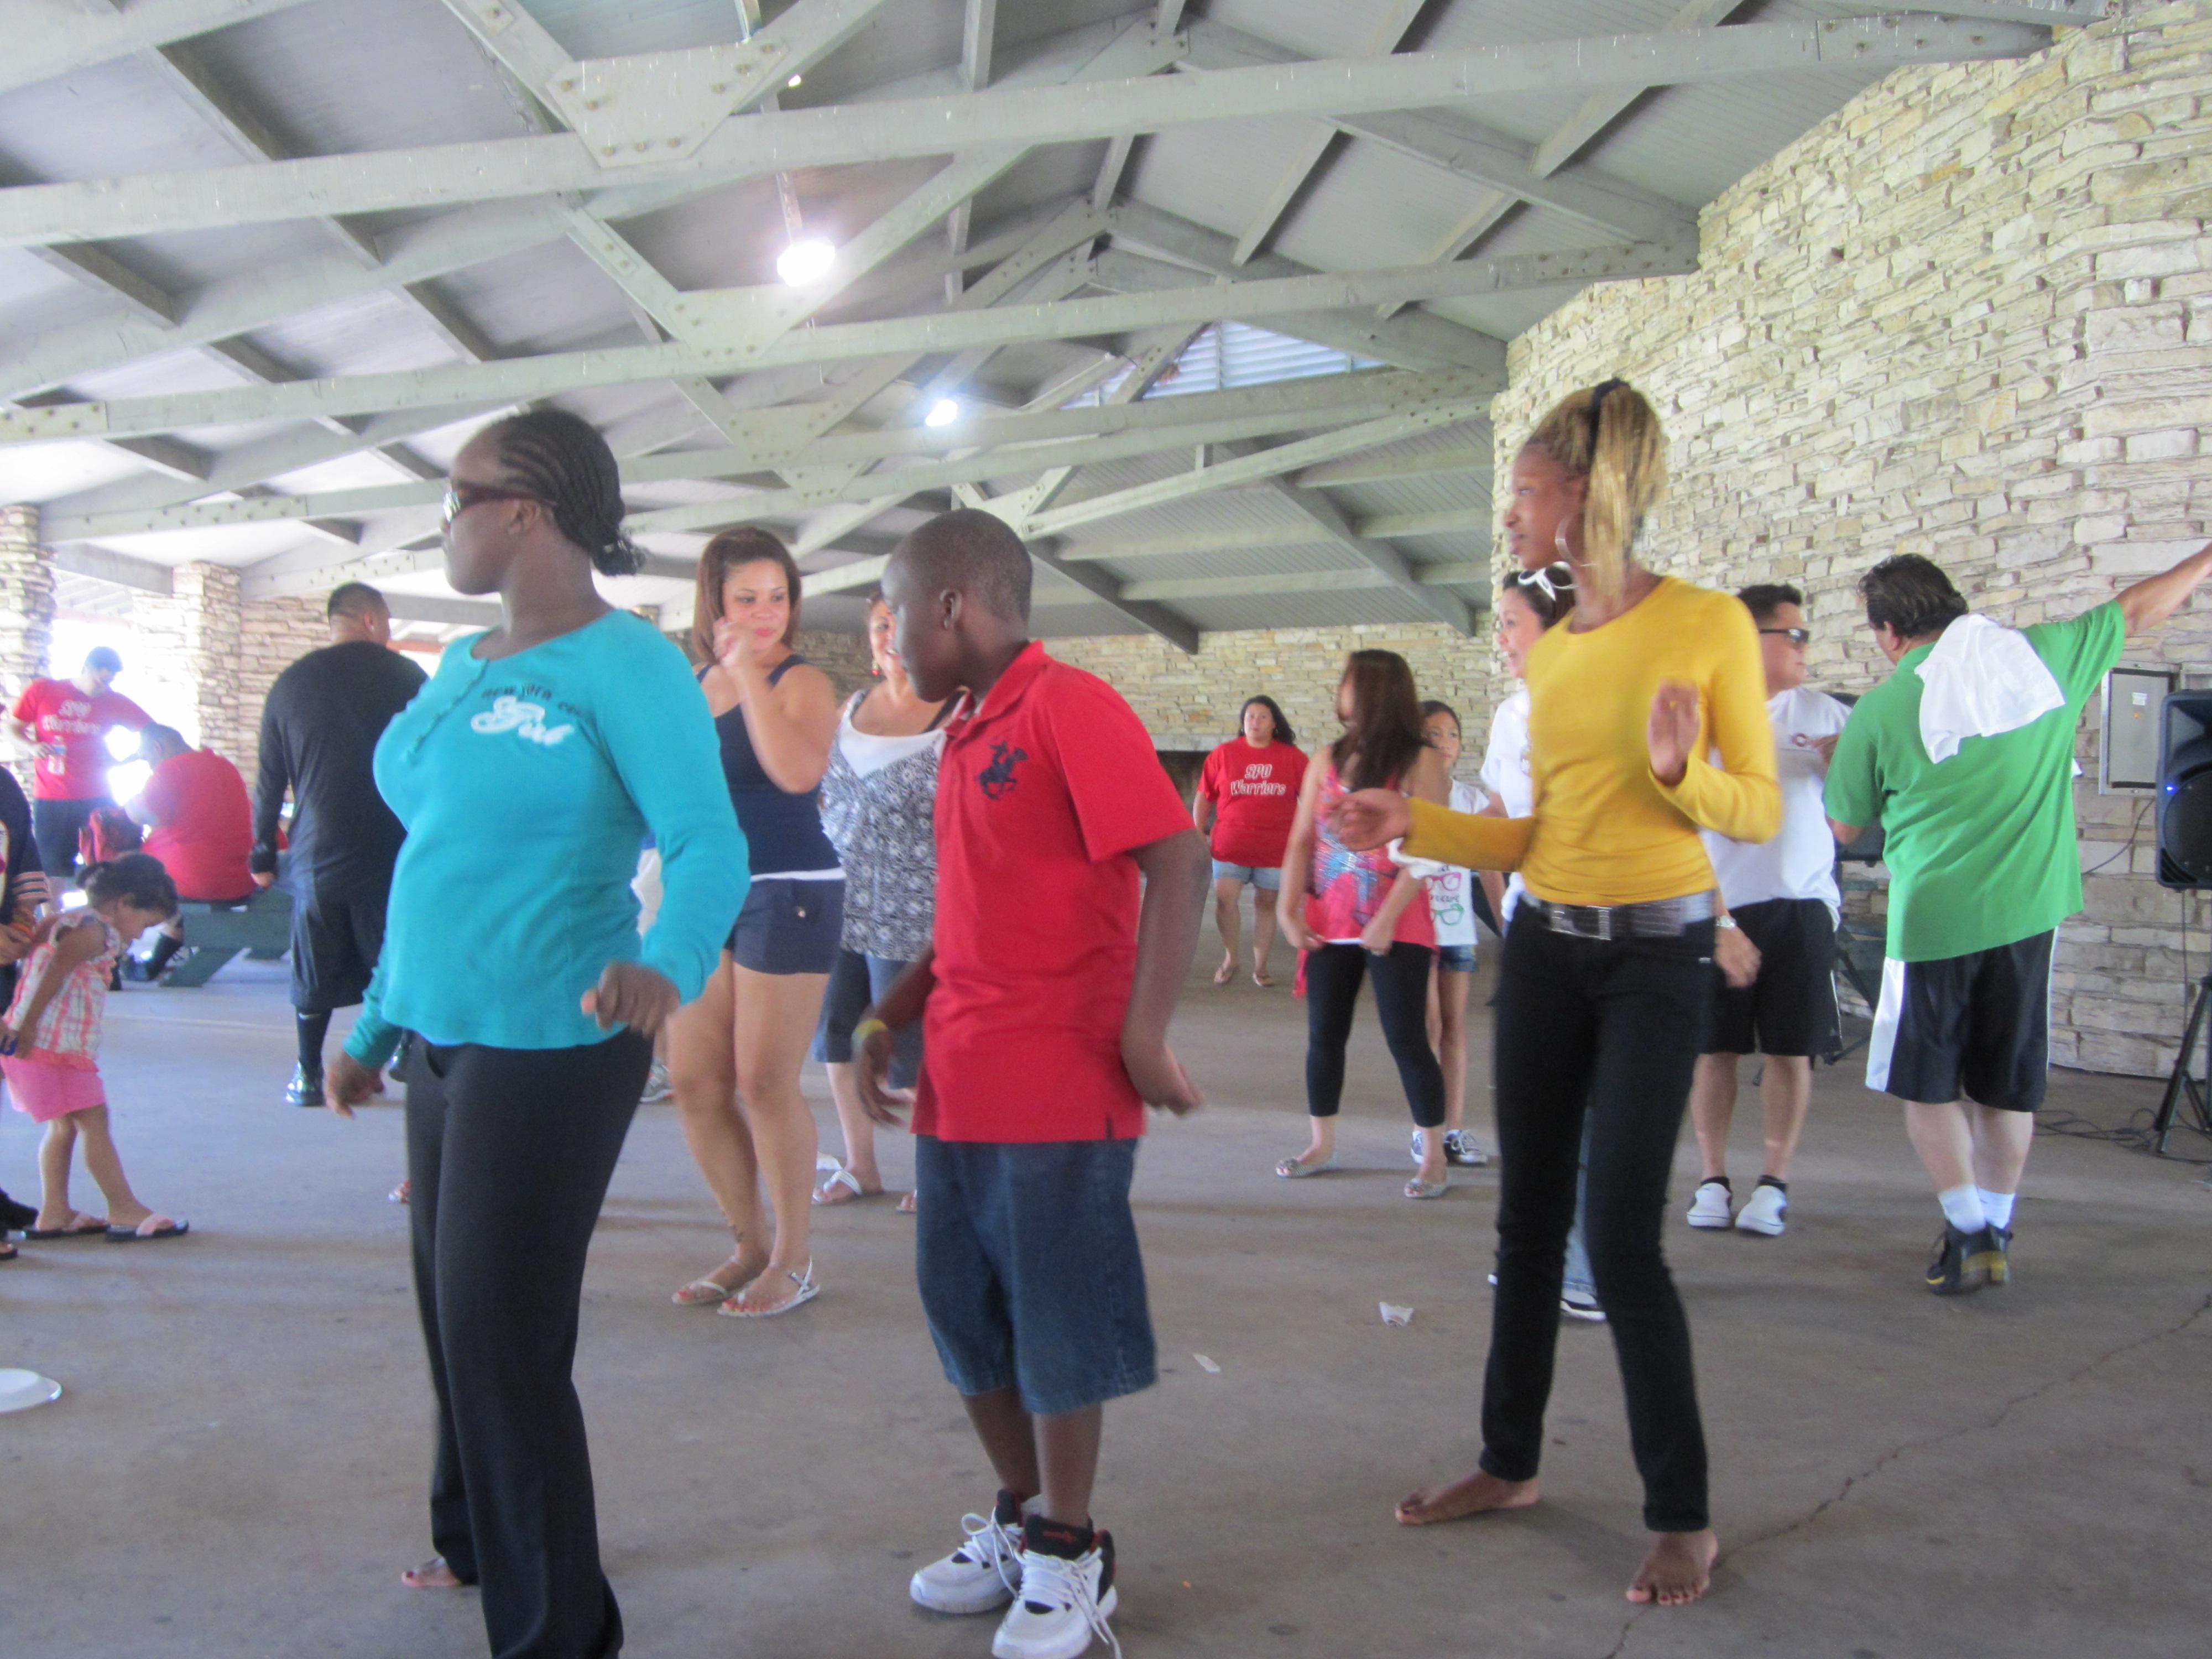 ICI Chicago nursing school sportsfest photo (69).jpg